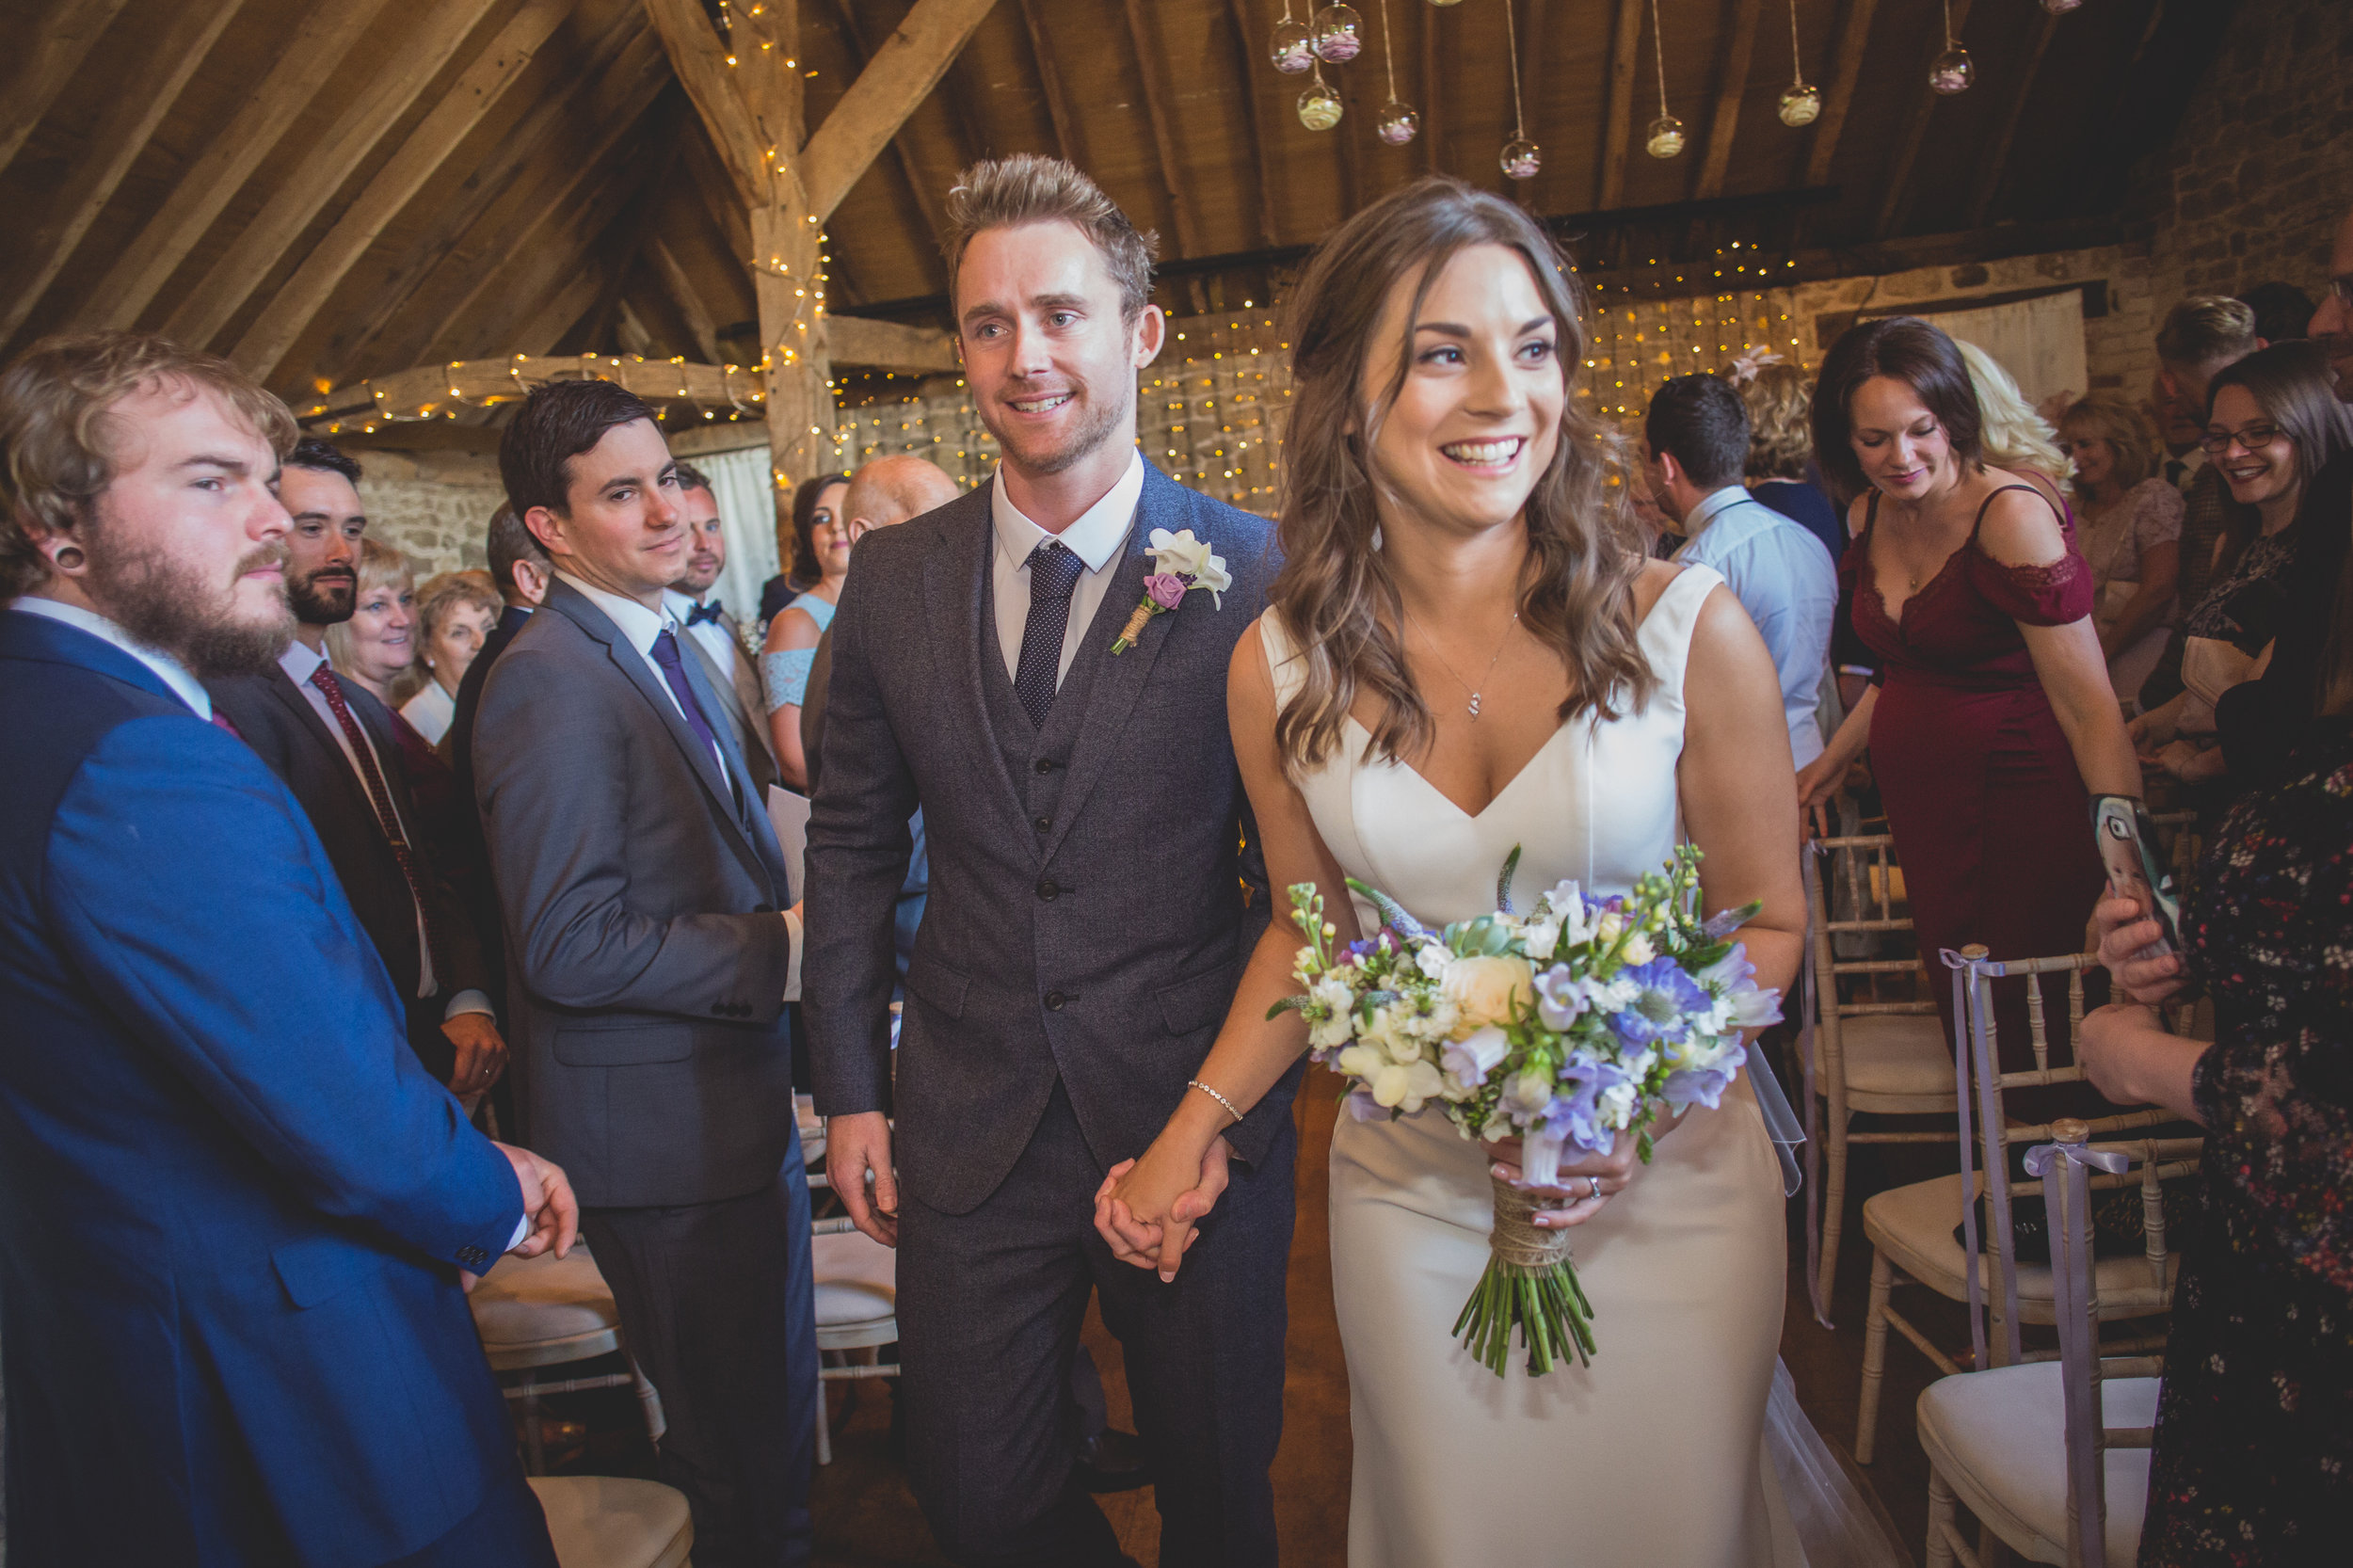 Grittenham Barn female wedding photographers west sussex petworth social-72.jpg